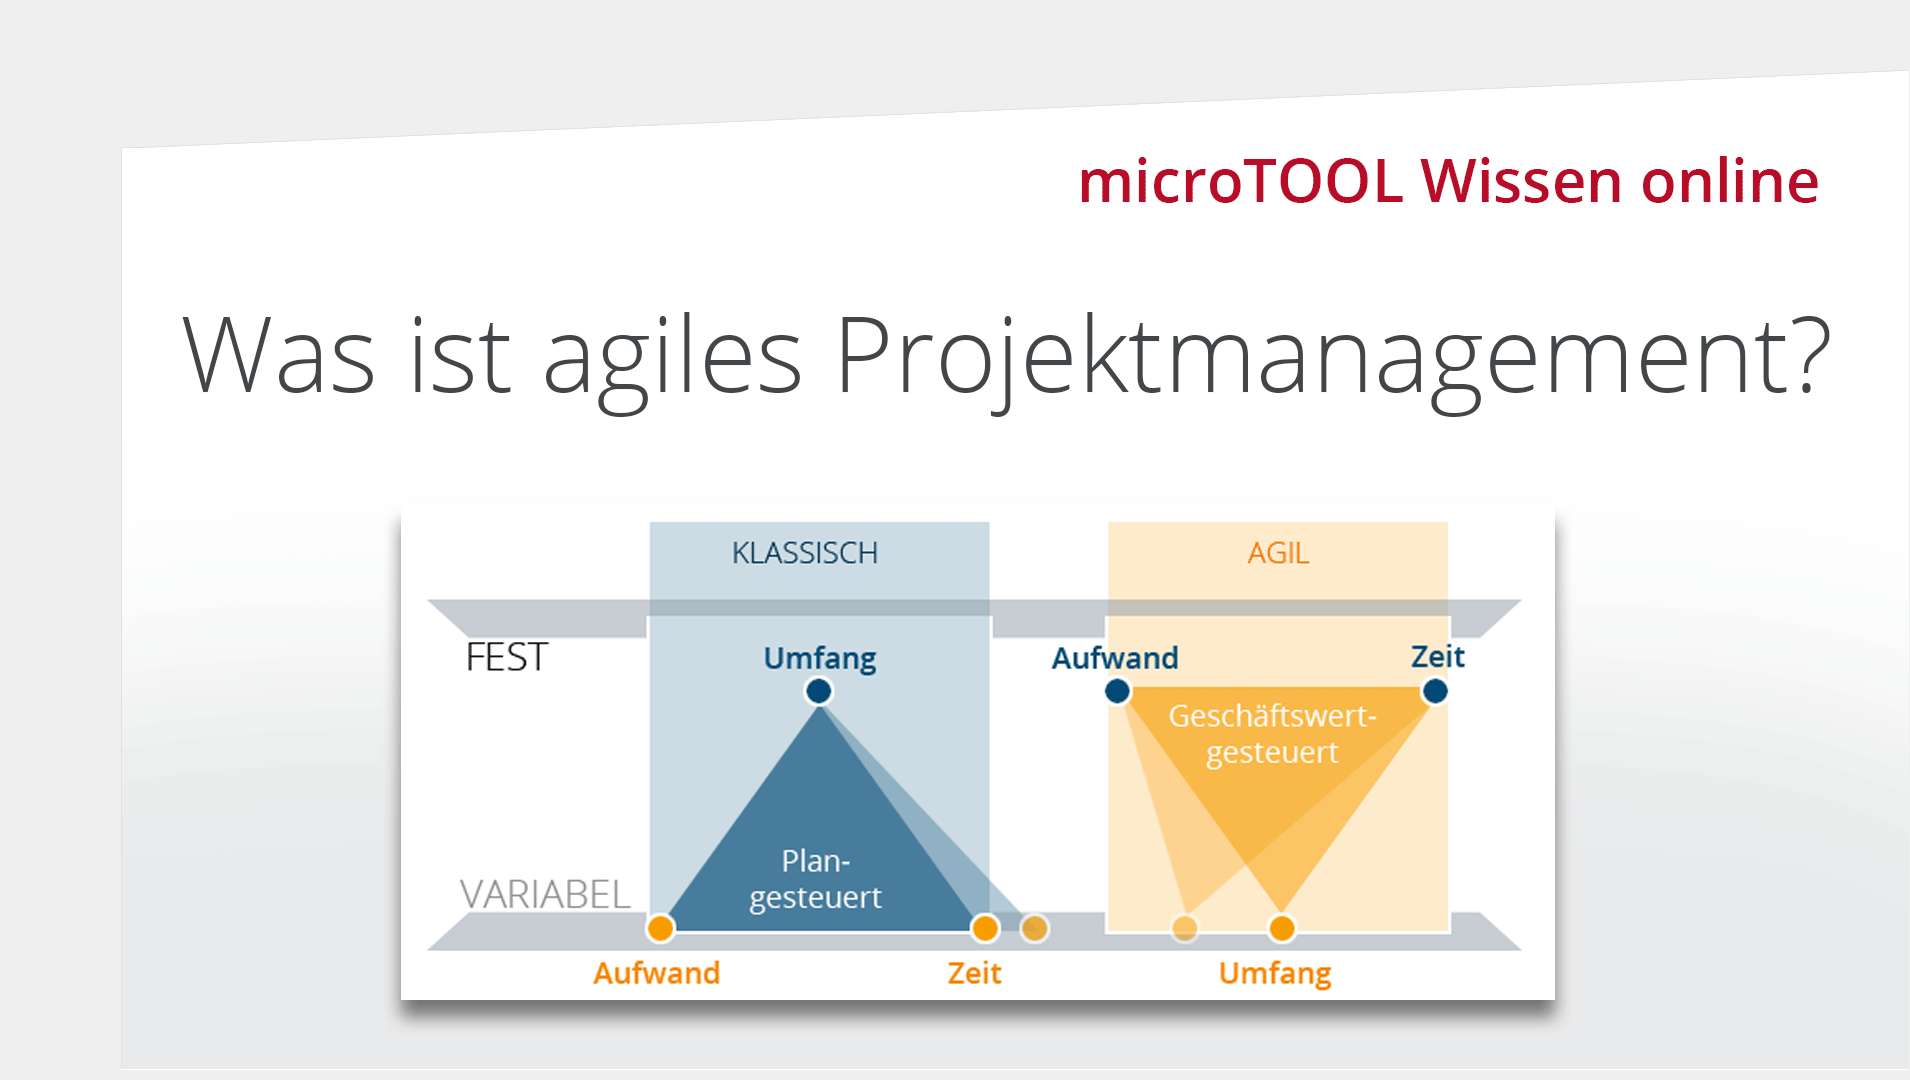 Wissen online: Was ist agiles Projektmanagement?